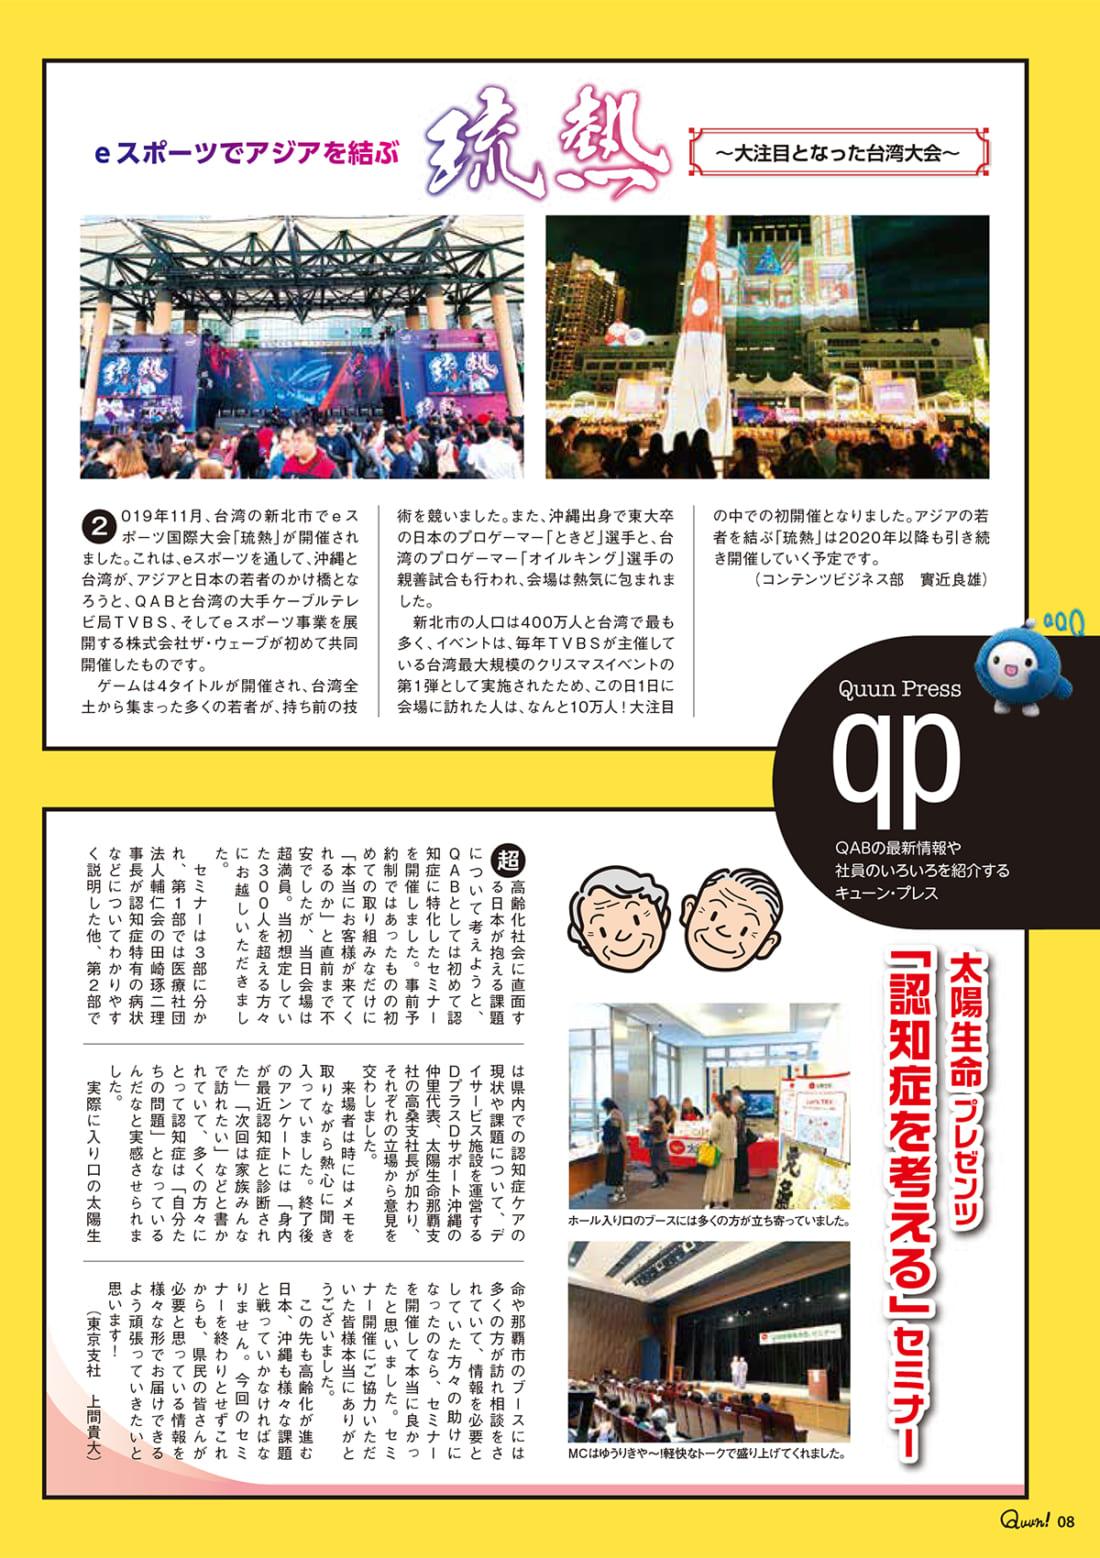 https://www.qab.co.jp/qgoro/wp-content/uploads/quun_1308-1100x1558.jpg